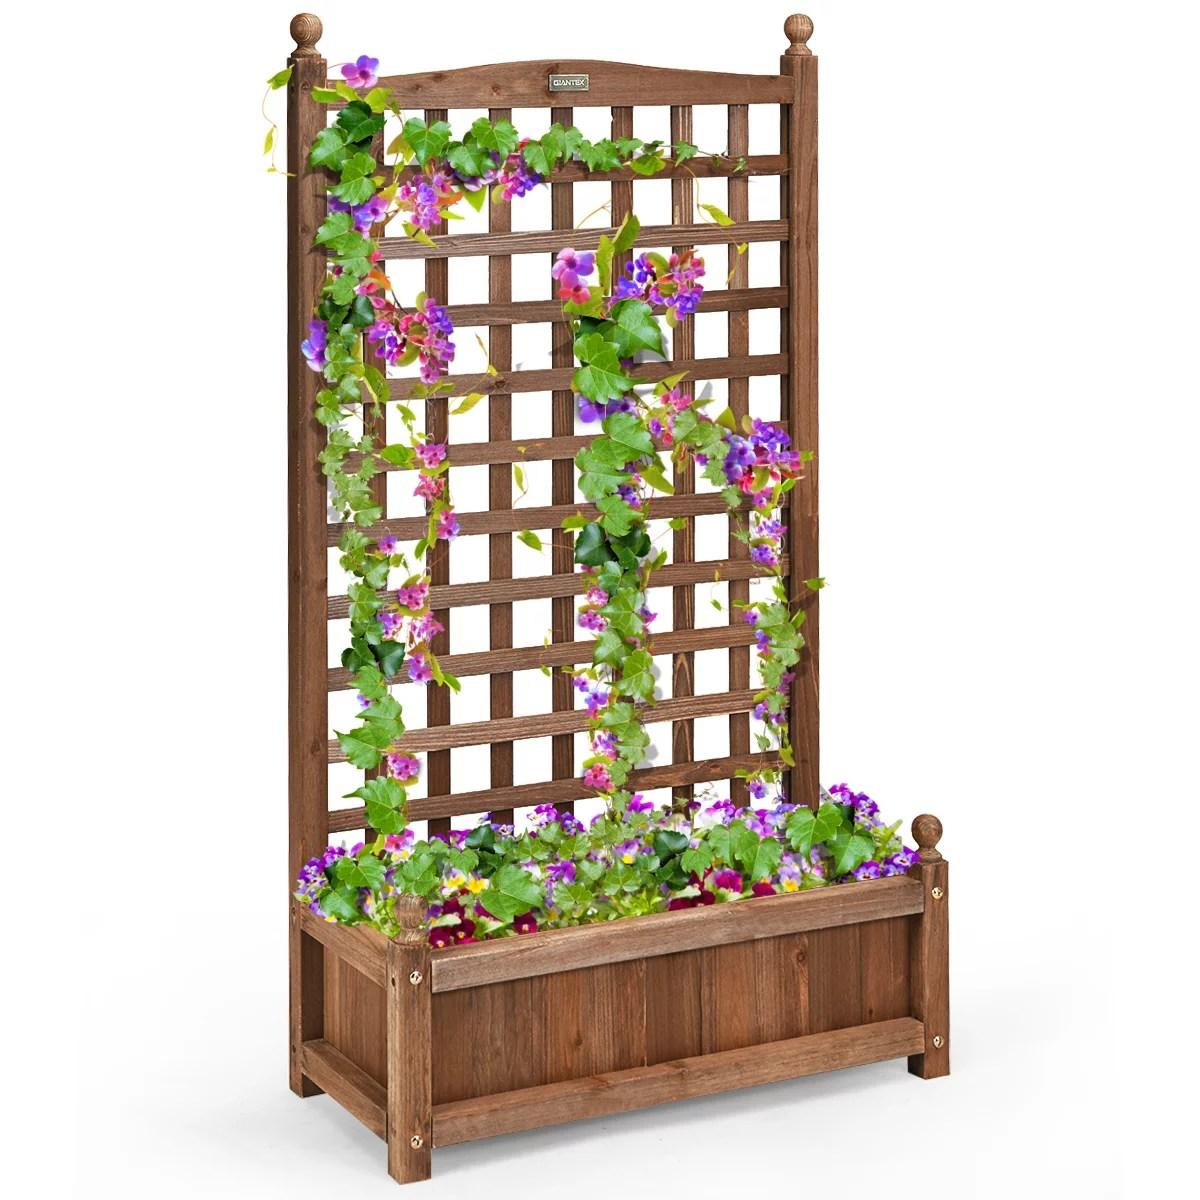 costway solid wood planter box with trellis weather resistant outdoor 25 x11 x48 walmart com